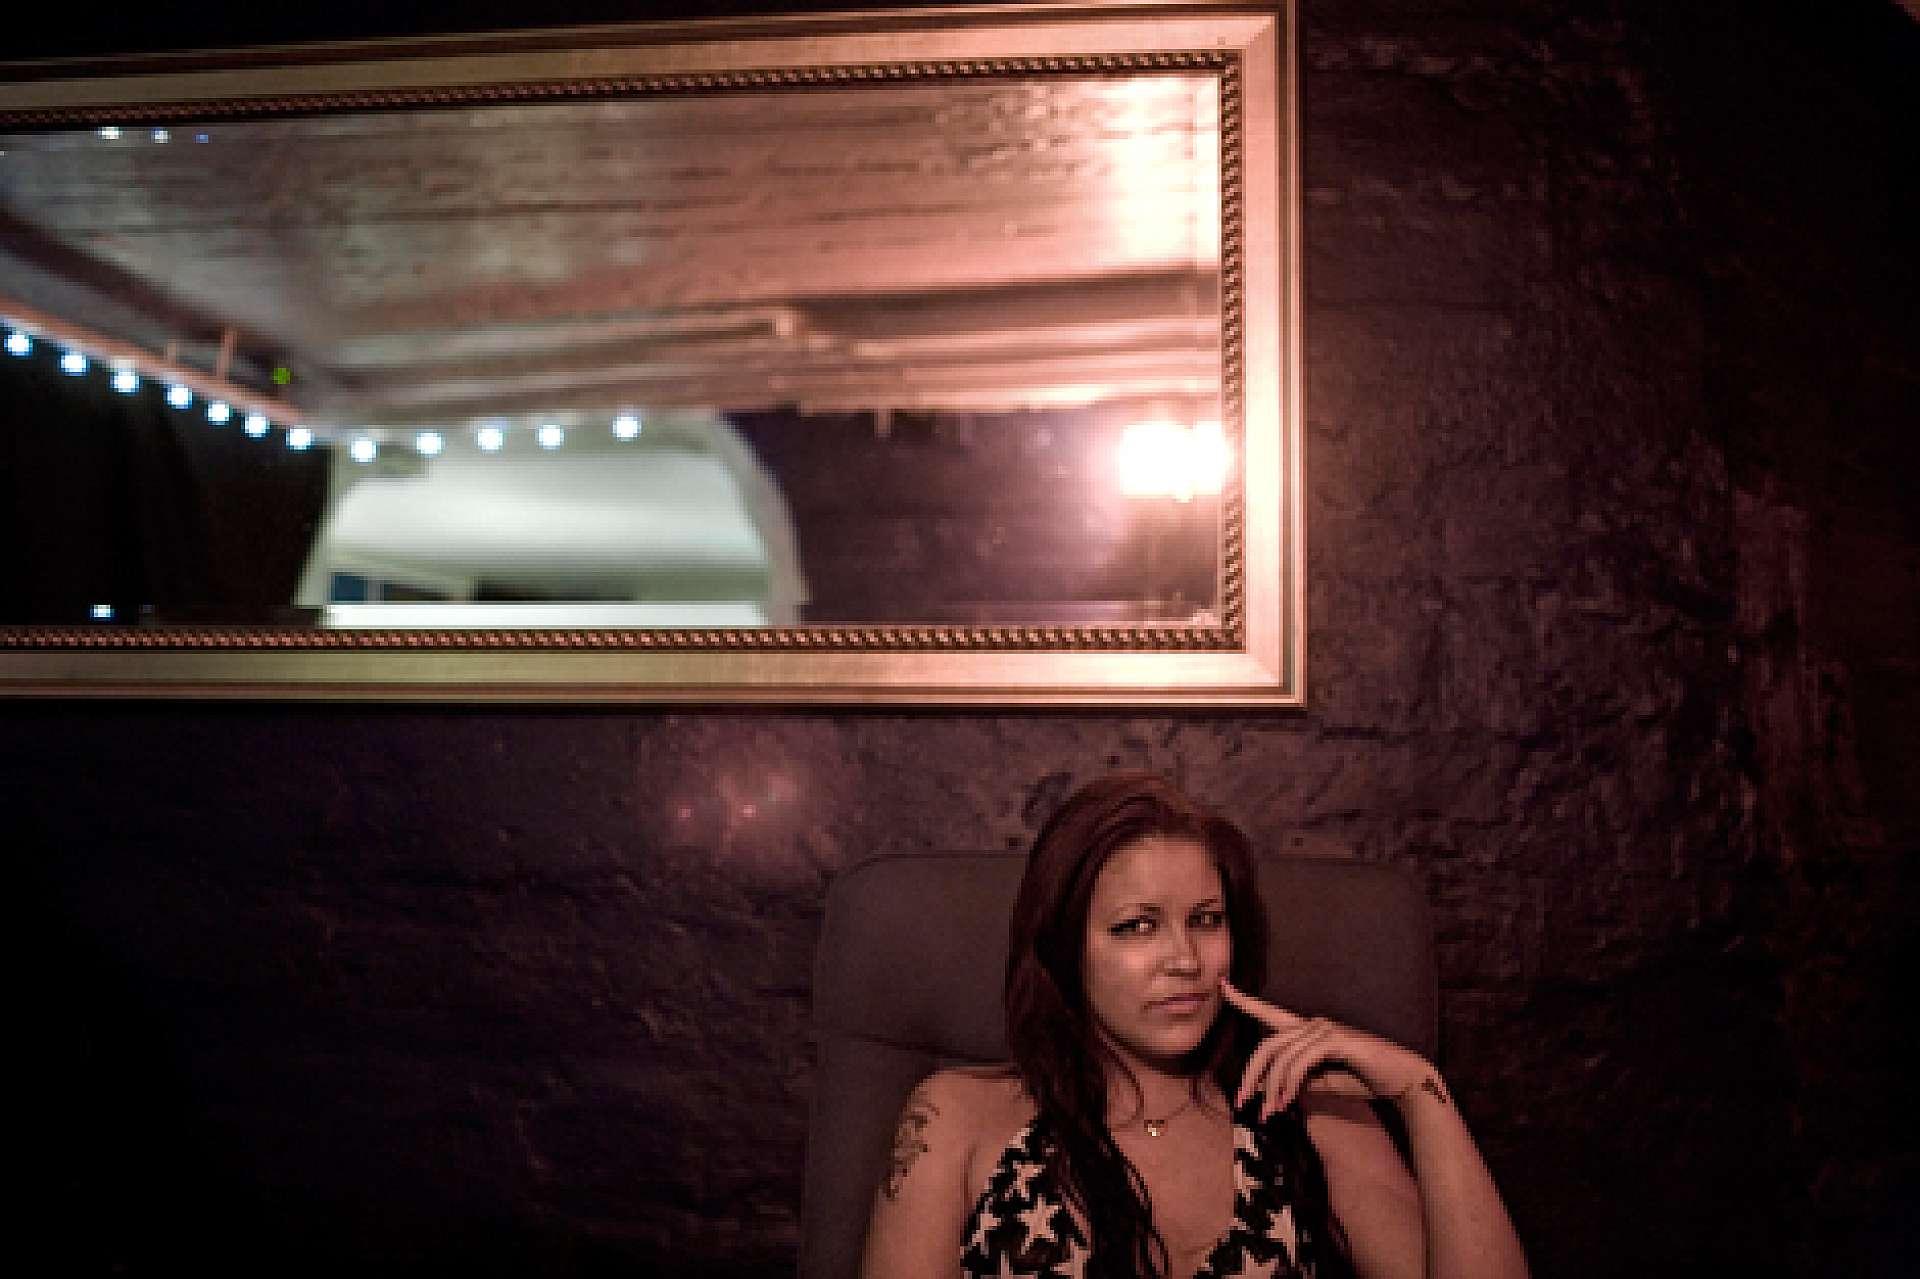 strippklubb stockholm bilder på nudister